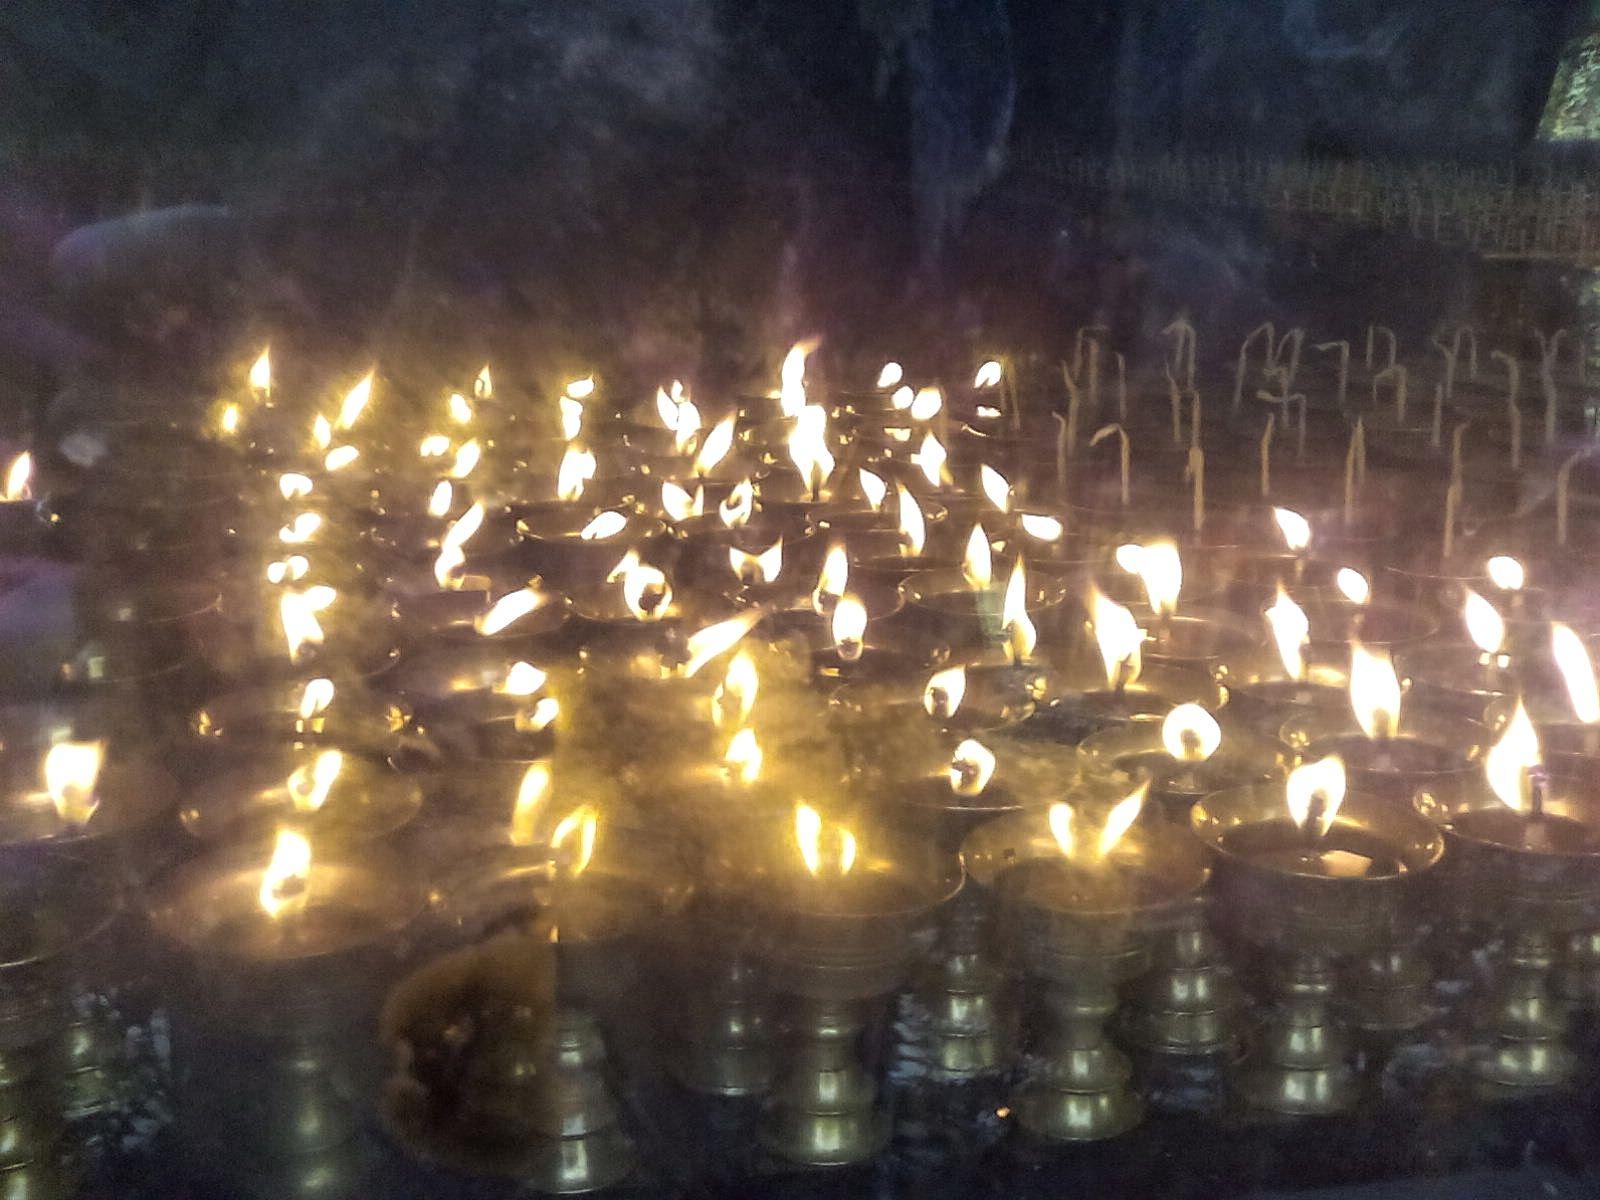 bouddhisme bougie lampe huile lumbini nepal